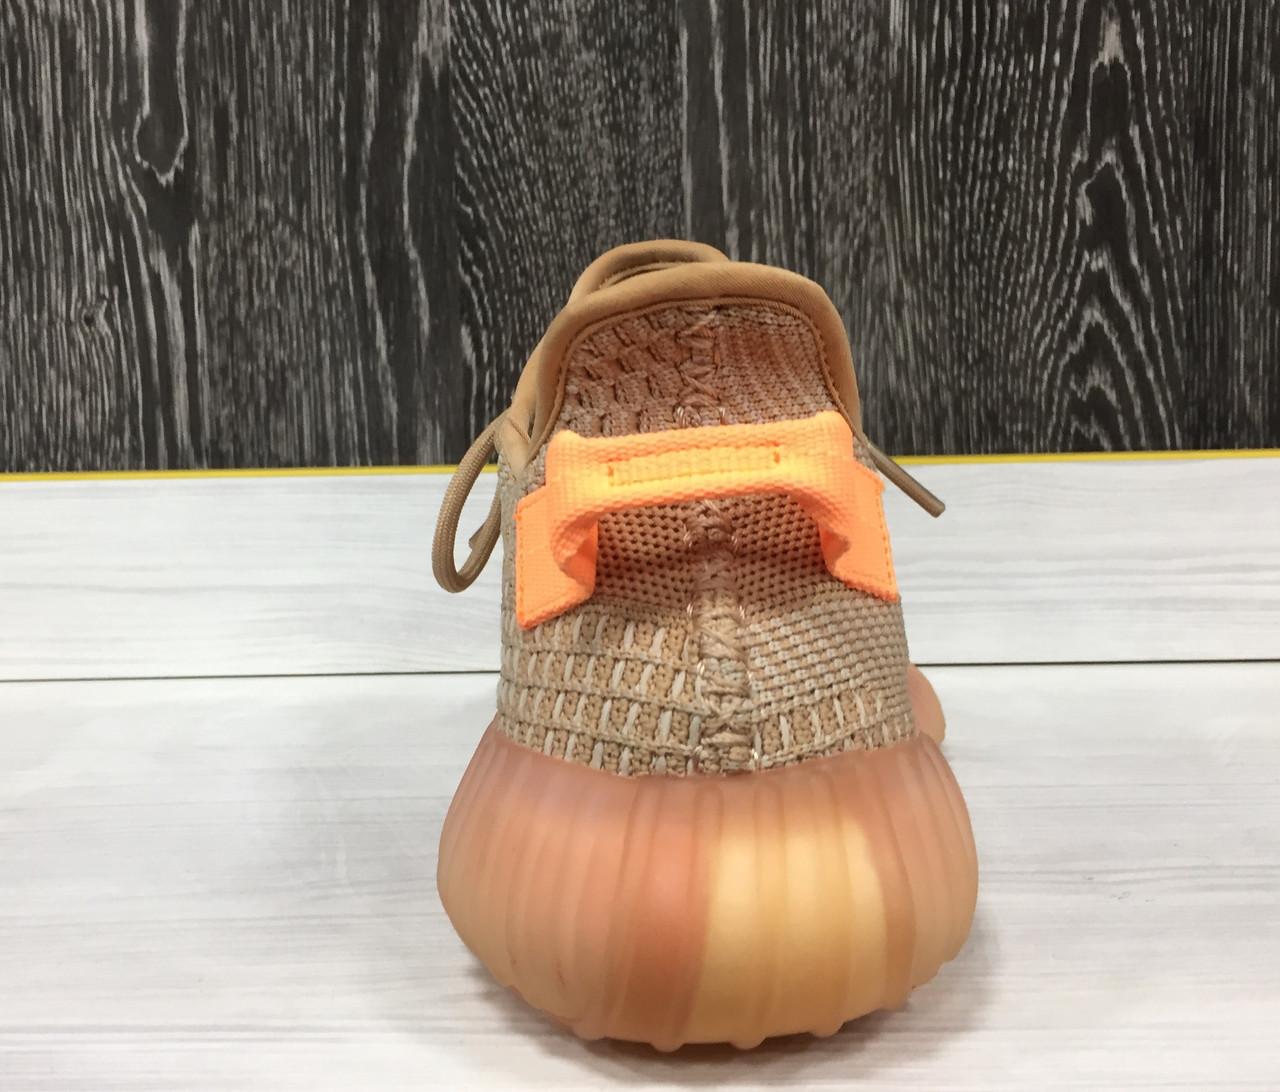 Кроссовки Adidas Yeezy Boost 350 V2 Clay (43 размер) - фото 2